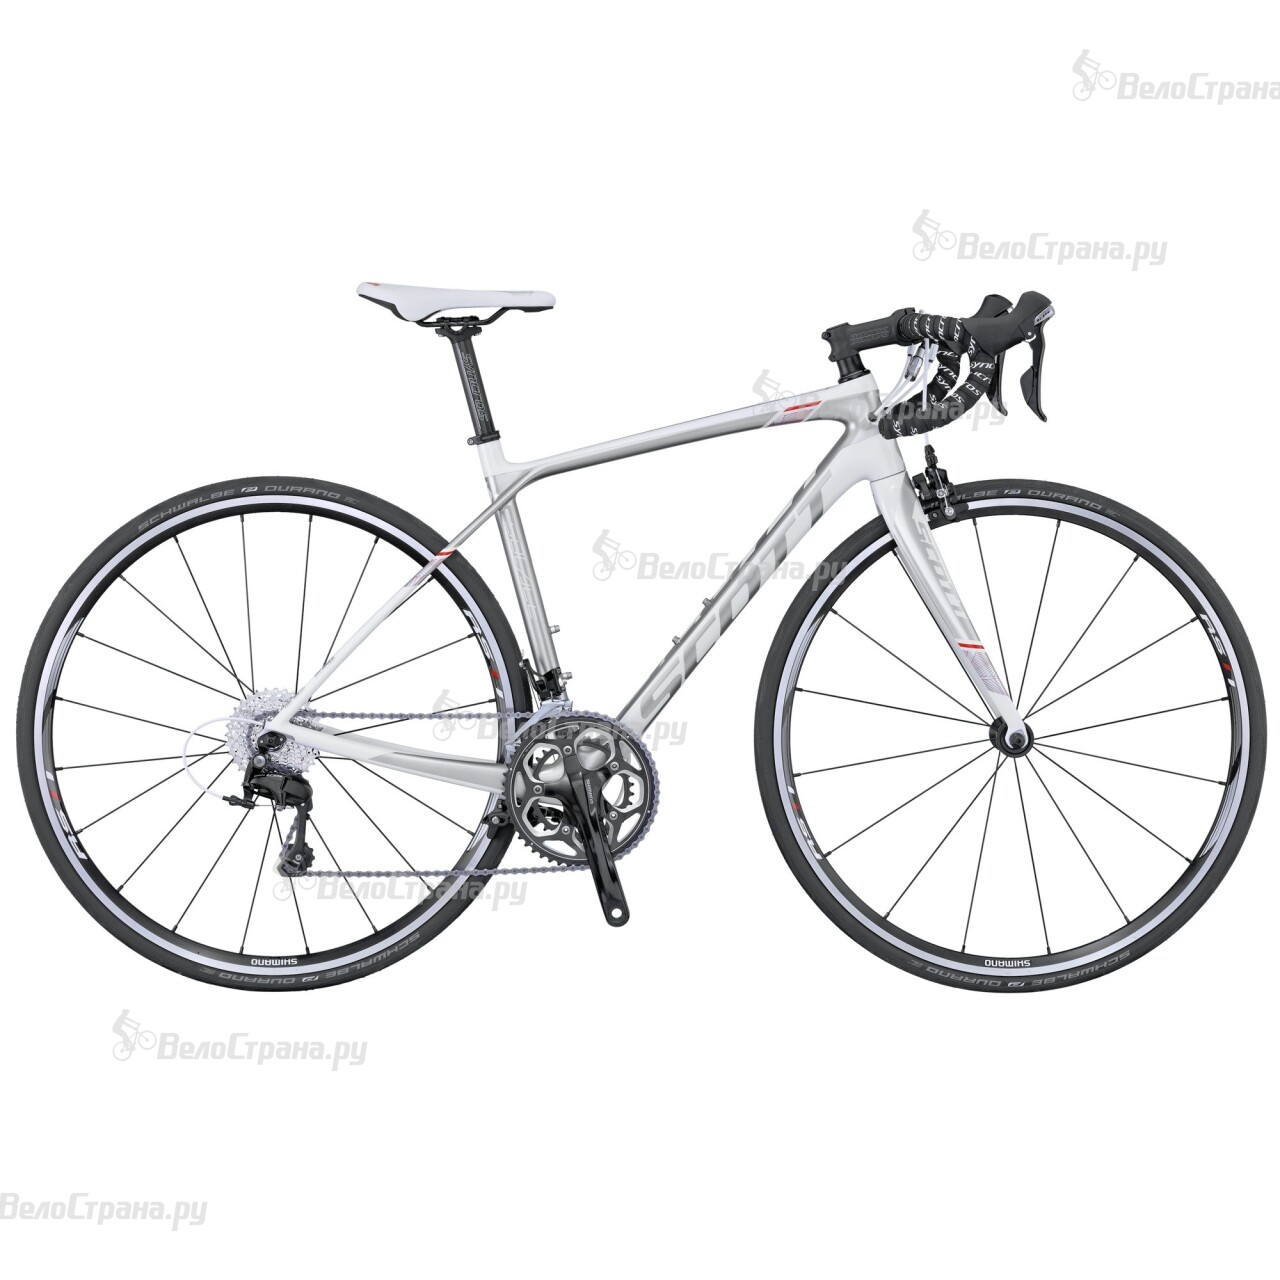 Велосипед Scott Contessa Solace 25 Compact (2016) велосипед scott contessa solace 15 compact 2015